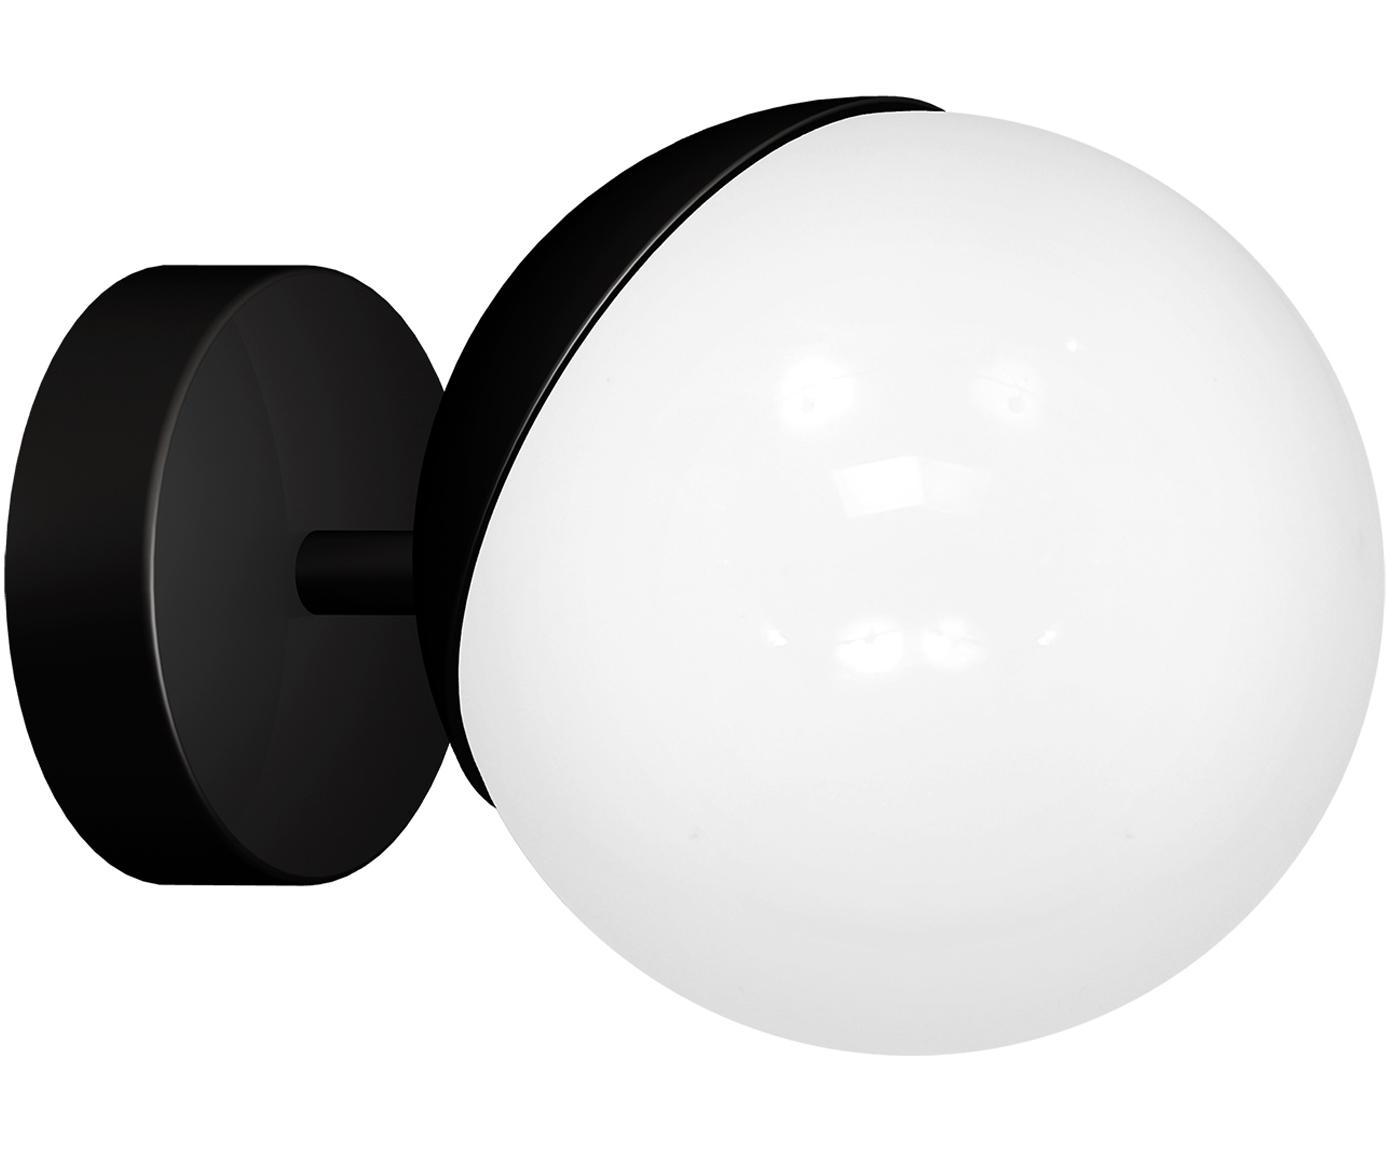 Applique en verre opalescent Sfera, Noir, blanc opalescent